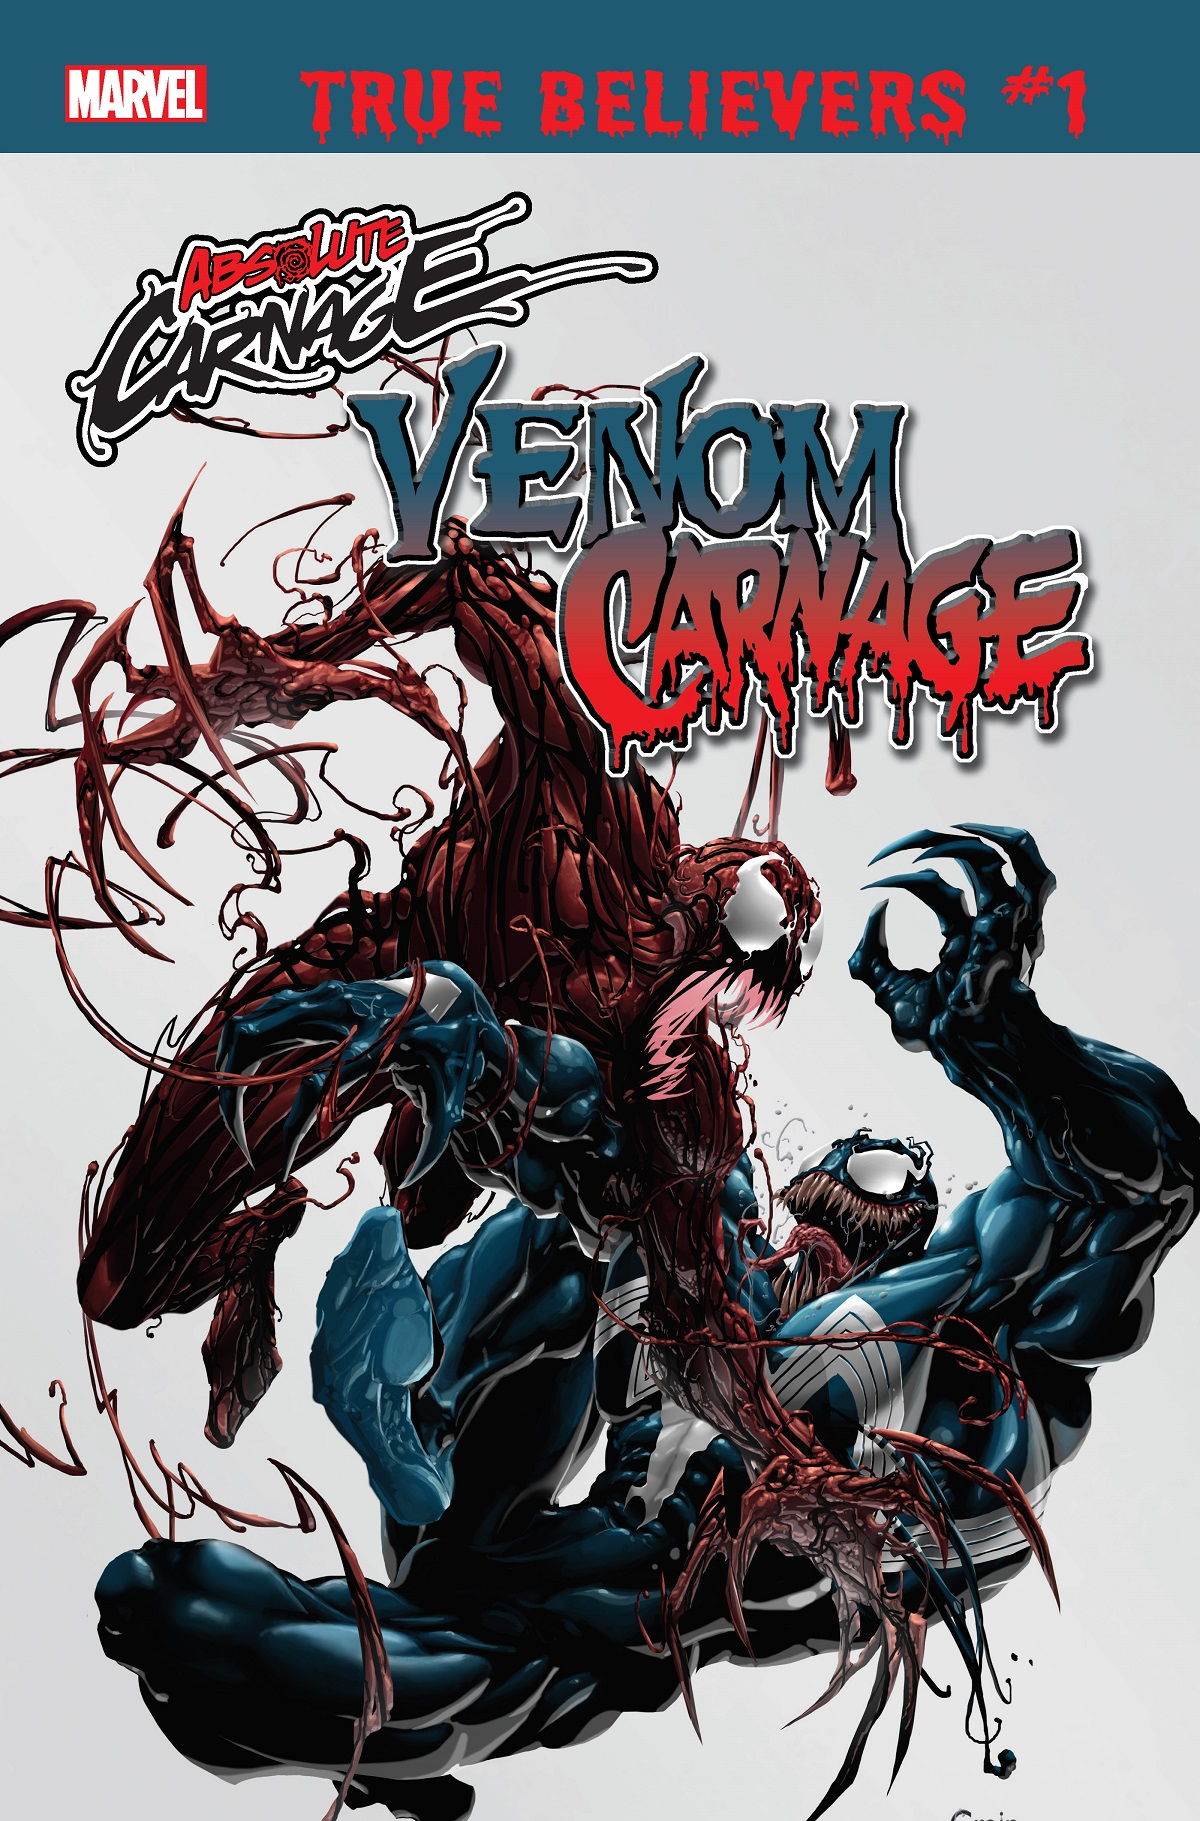 True Believers: Absolute Carnage - Venom Vs. Carnage (2019) #1